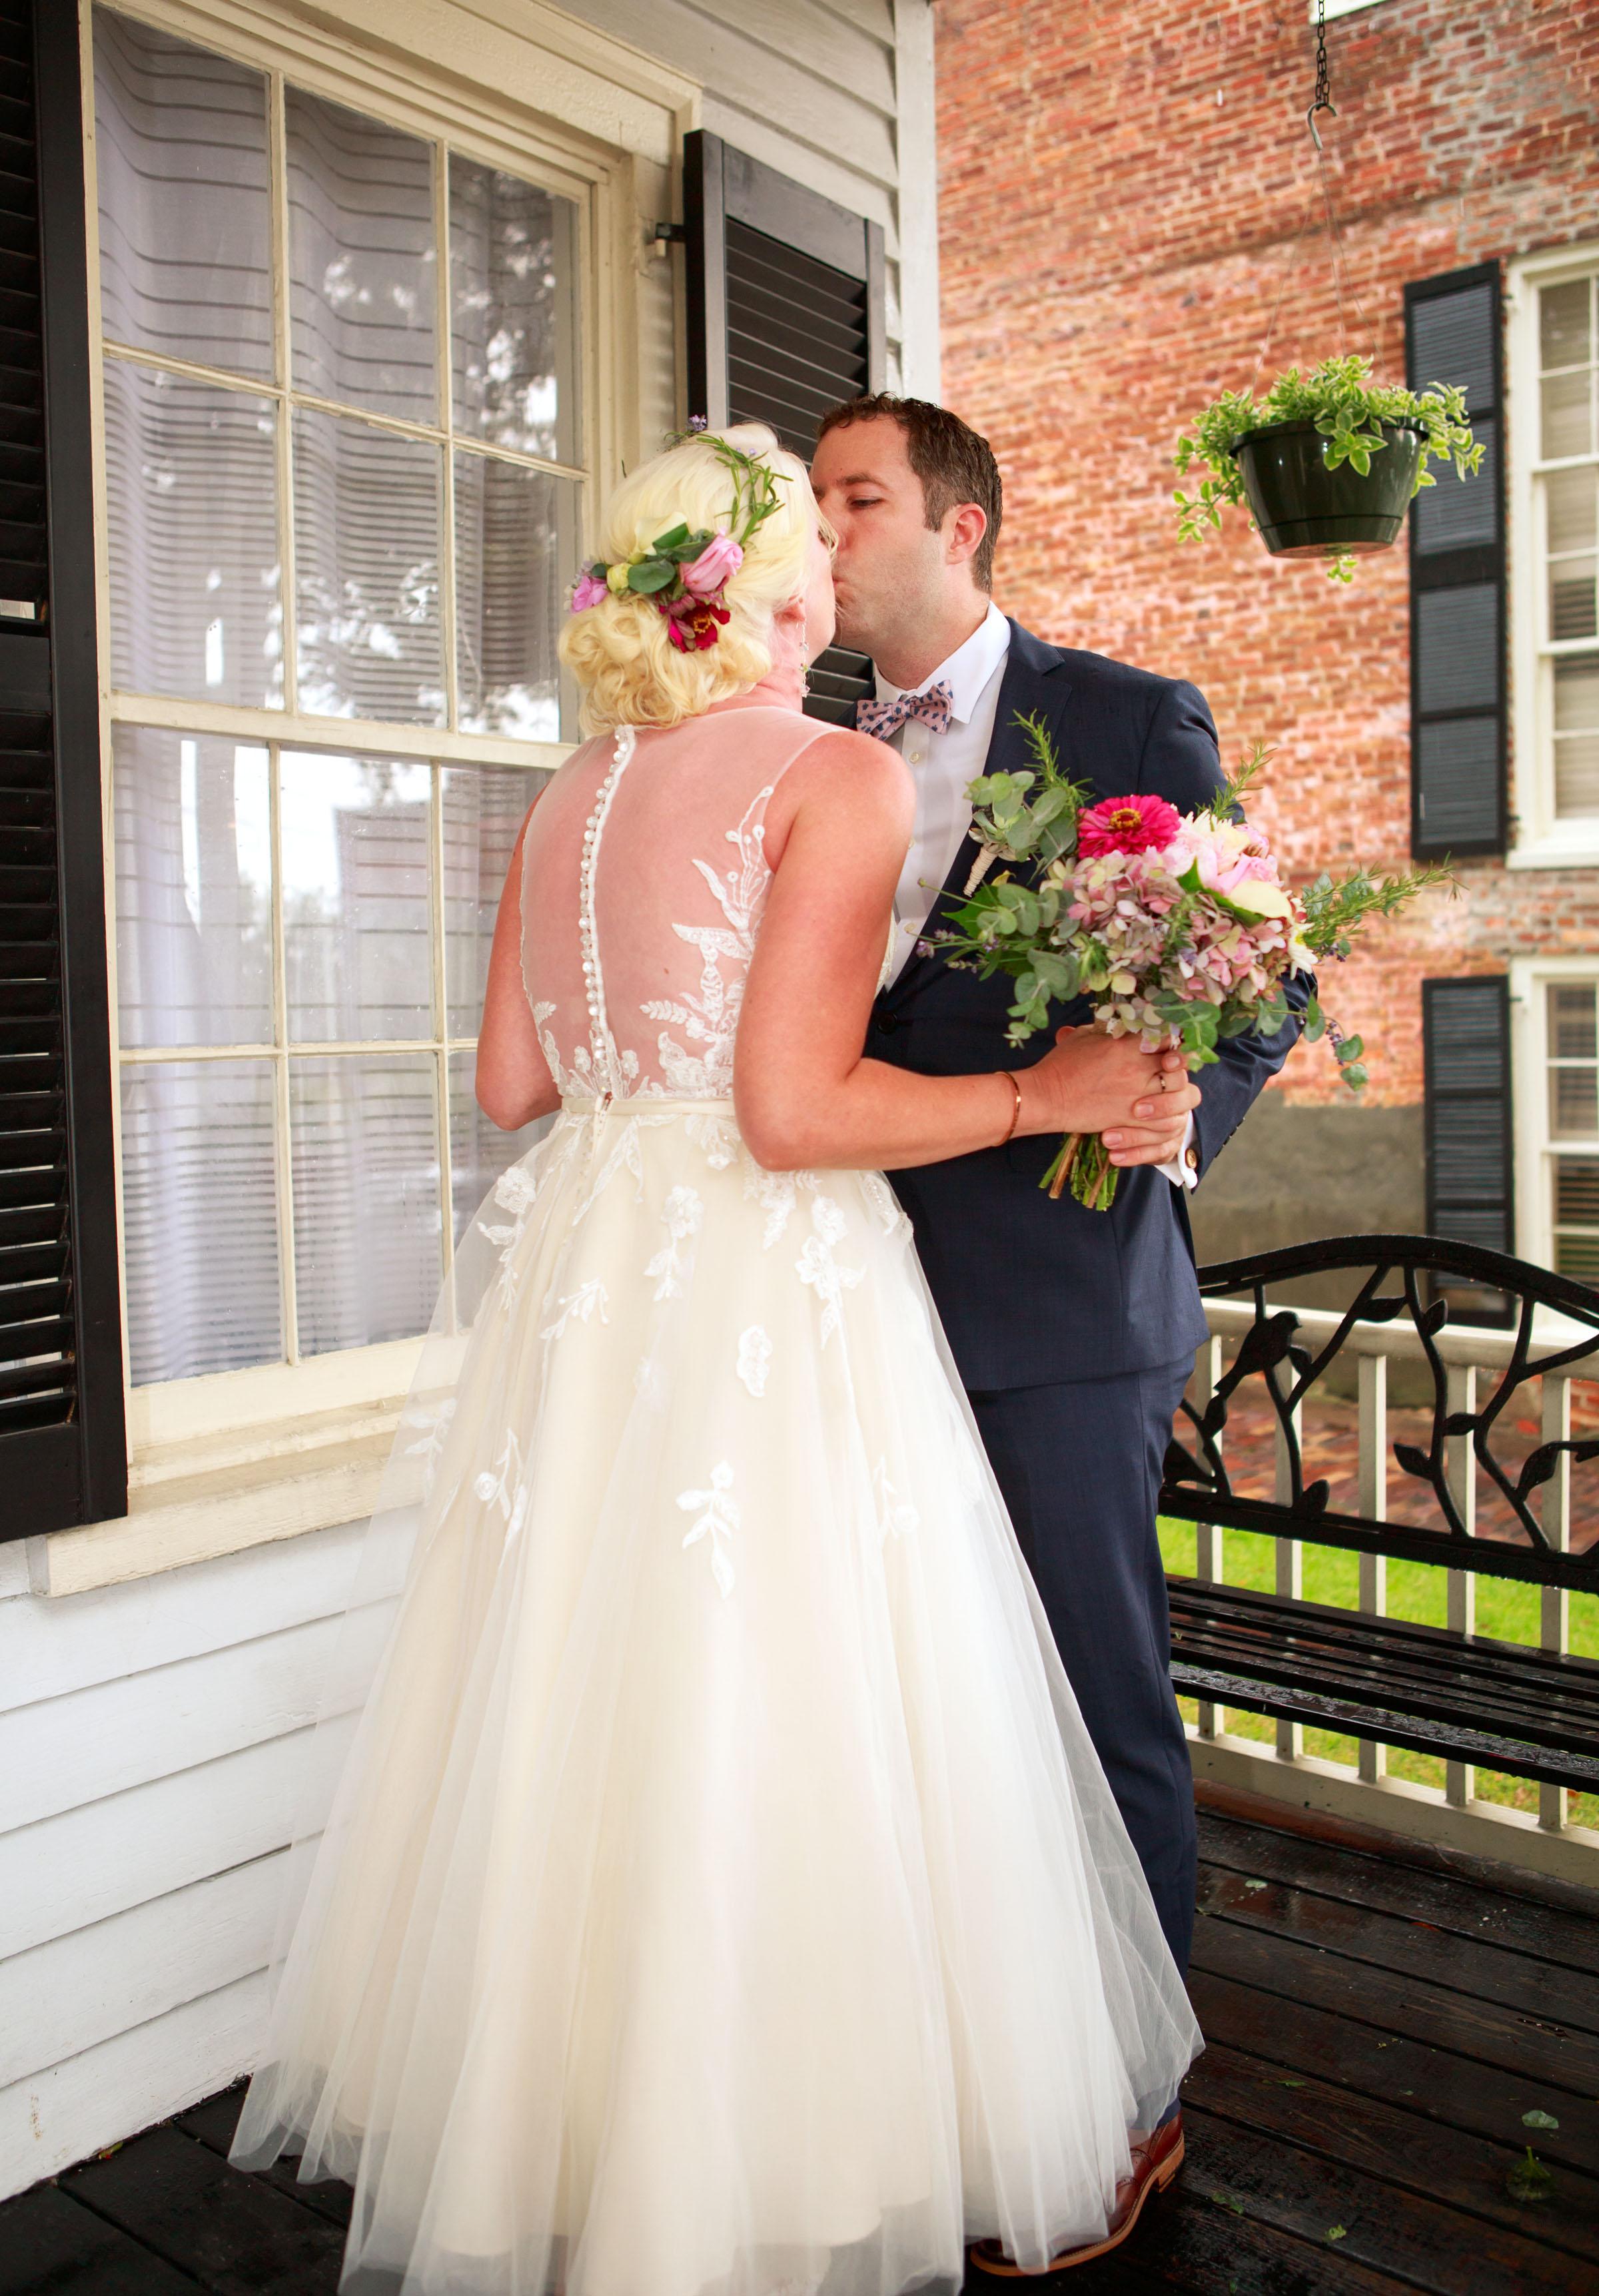 128-South-Wedding-Tiffany-Abruzzo-Photography-First-Look-8.jpg